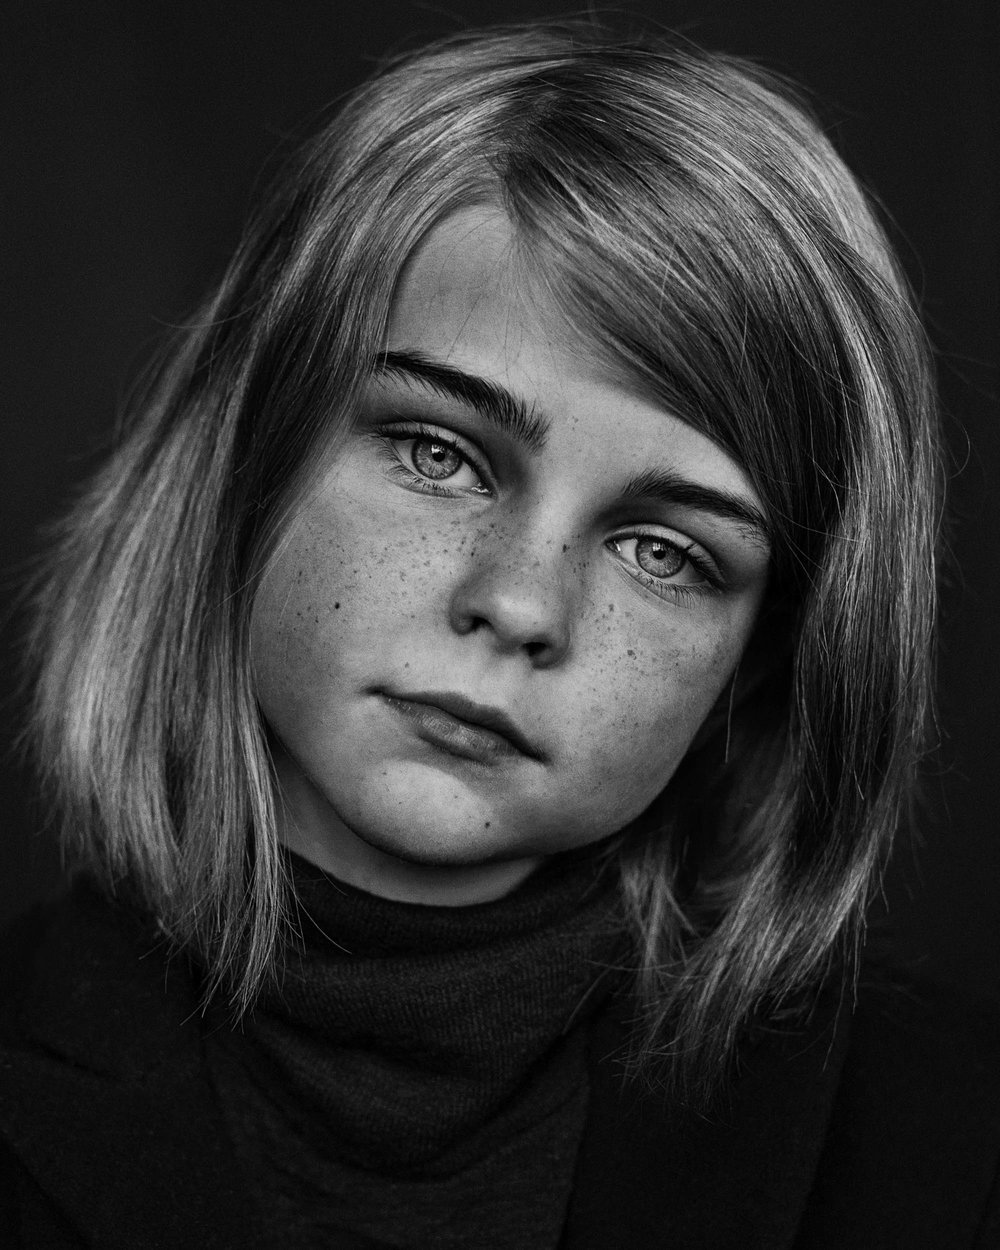 Children's Portrait of Charlotte by Nick Walters at Lumi Studio in Melbourne.jpg